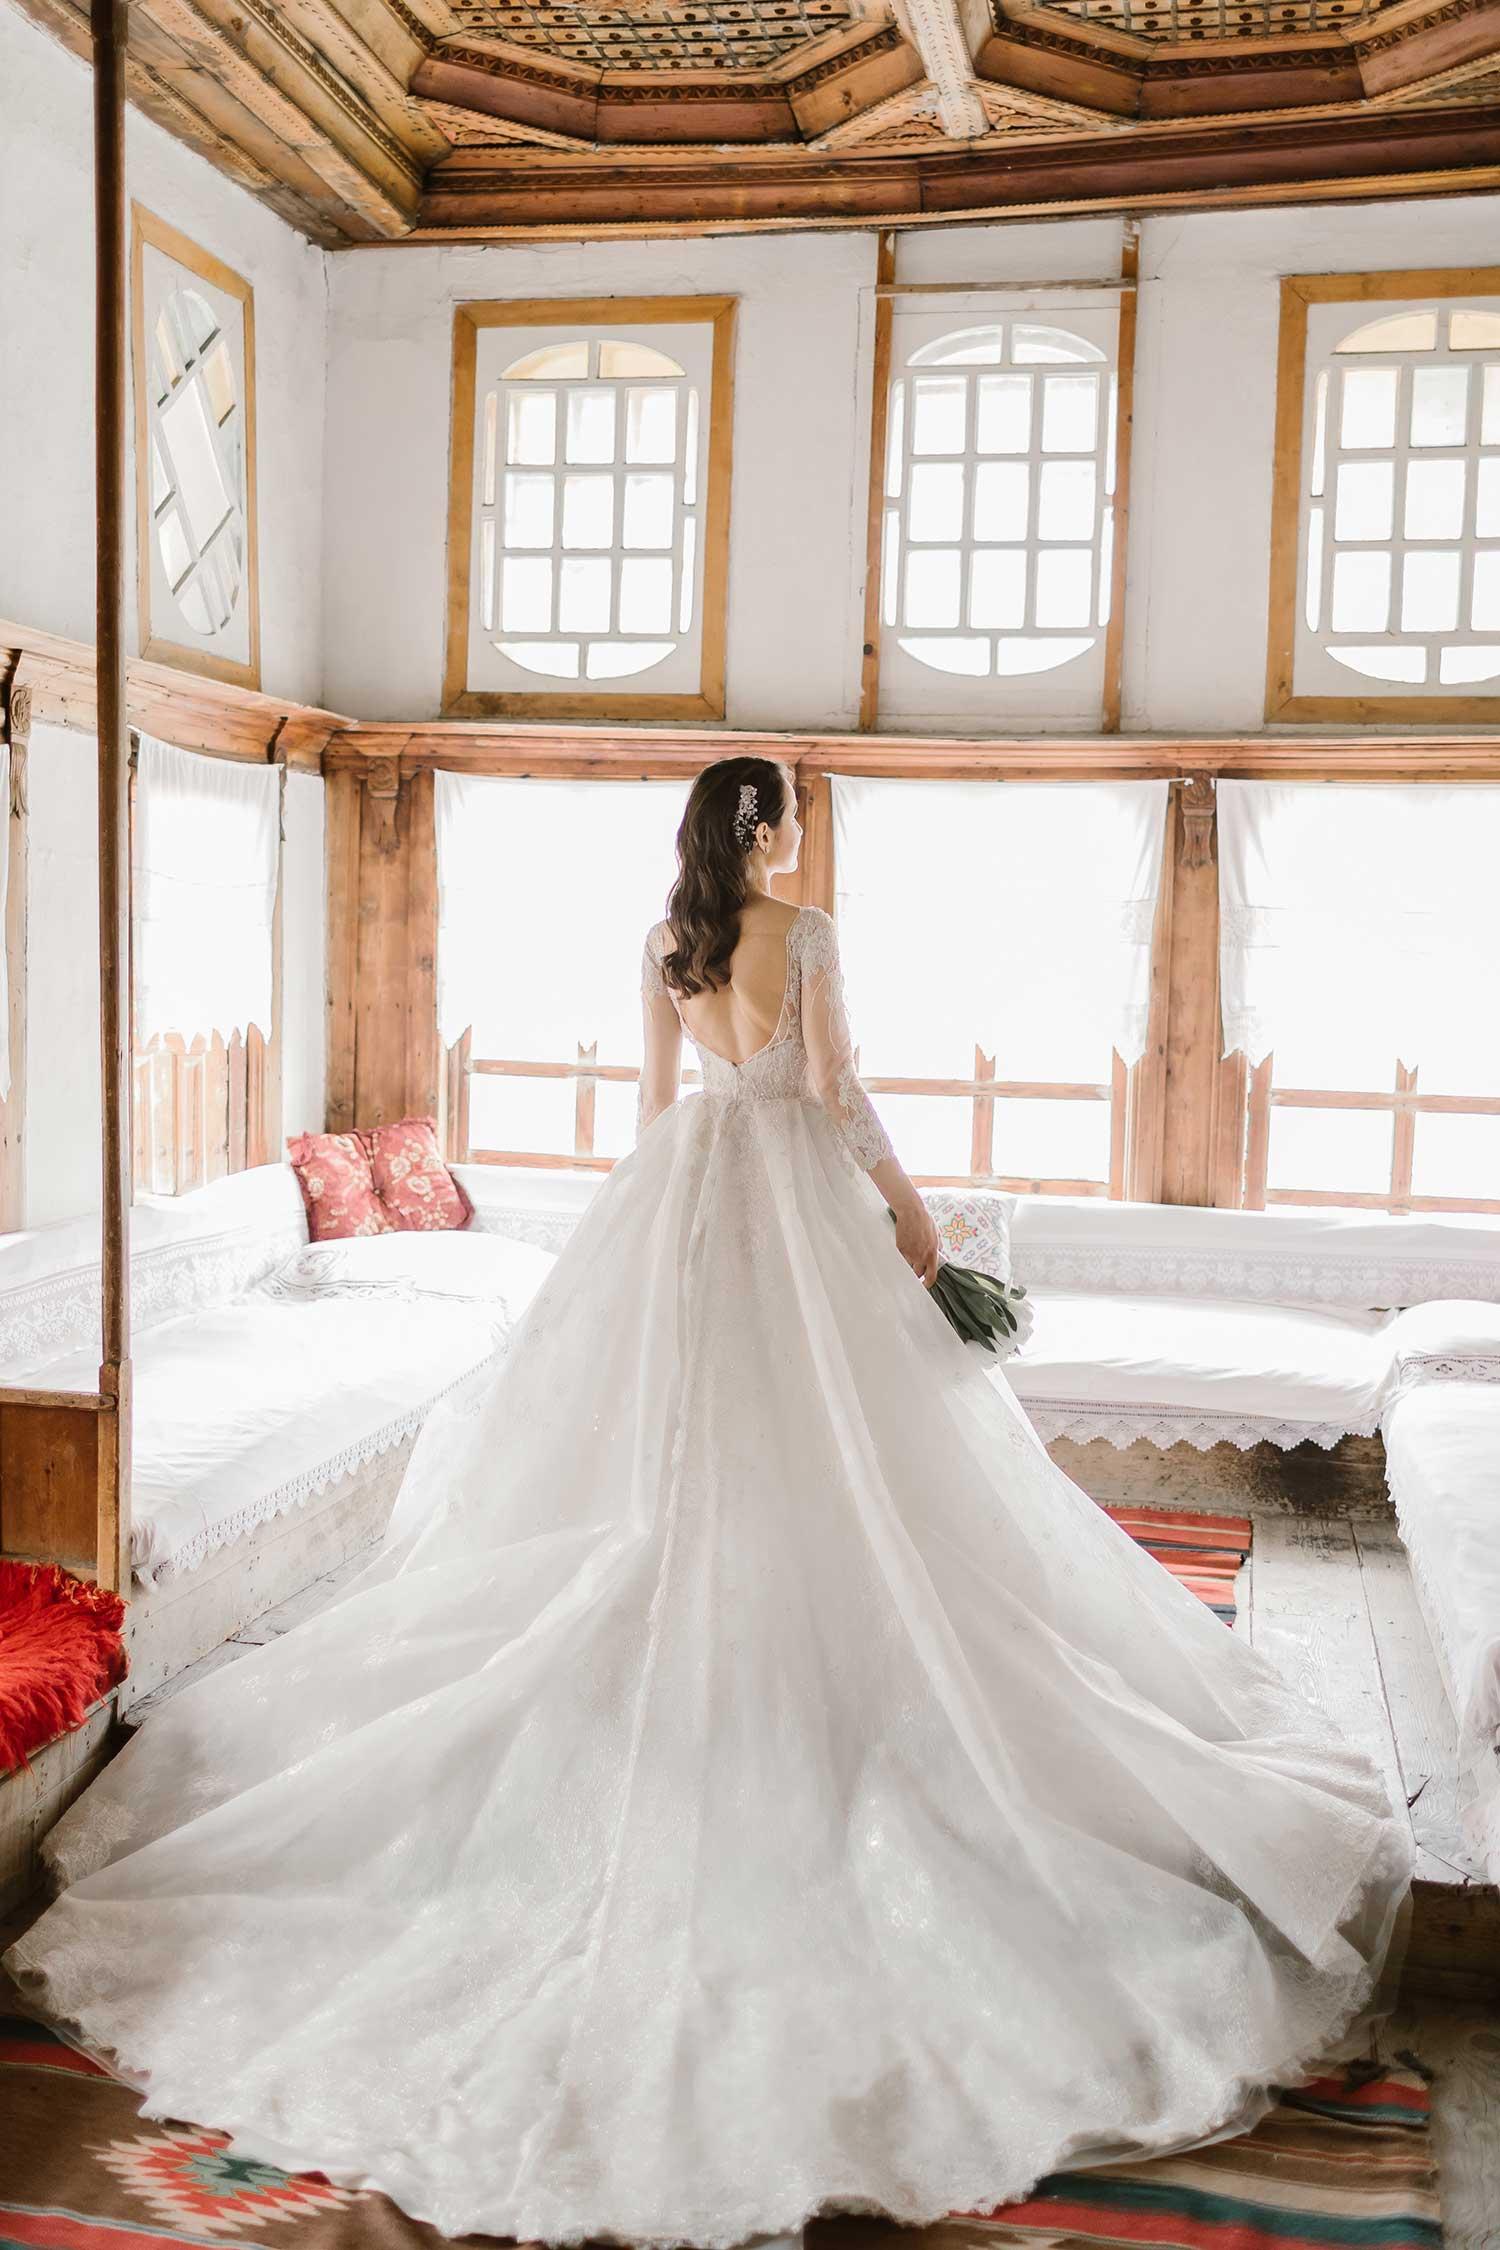 Bride posing with a wedding dress inside a house in Gjirokaster